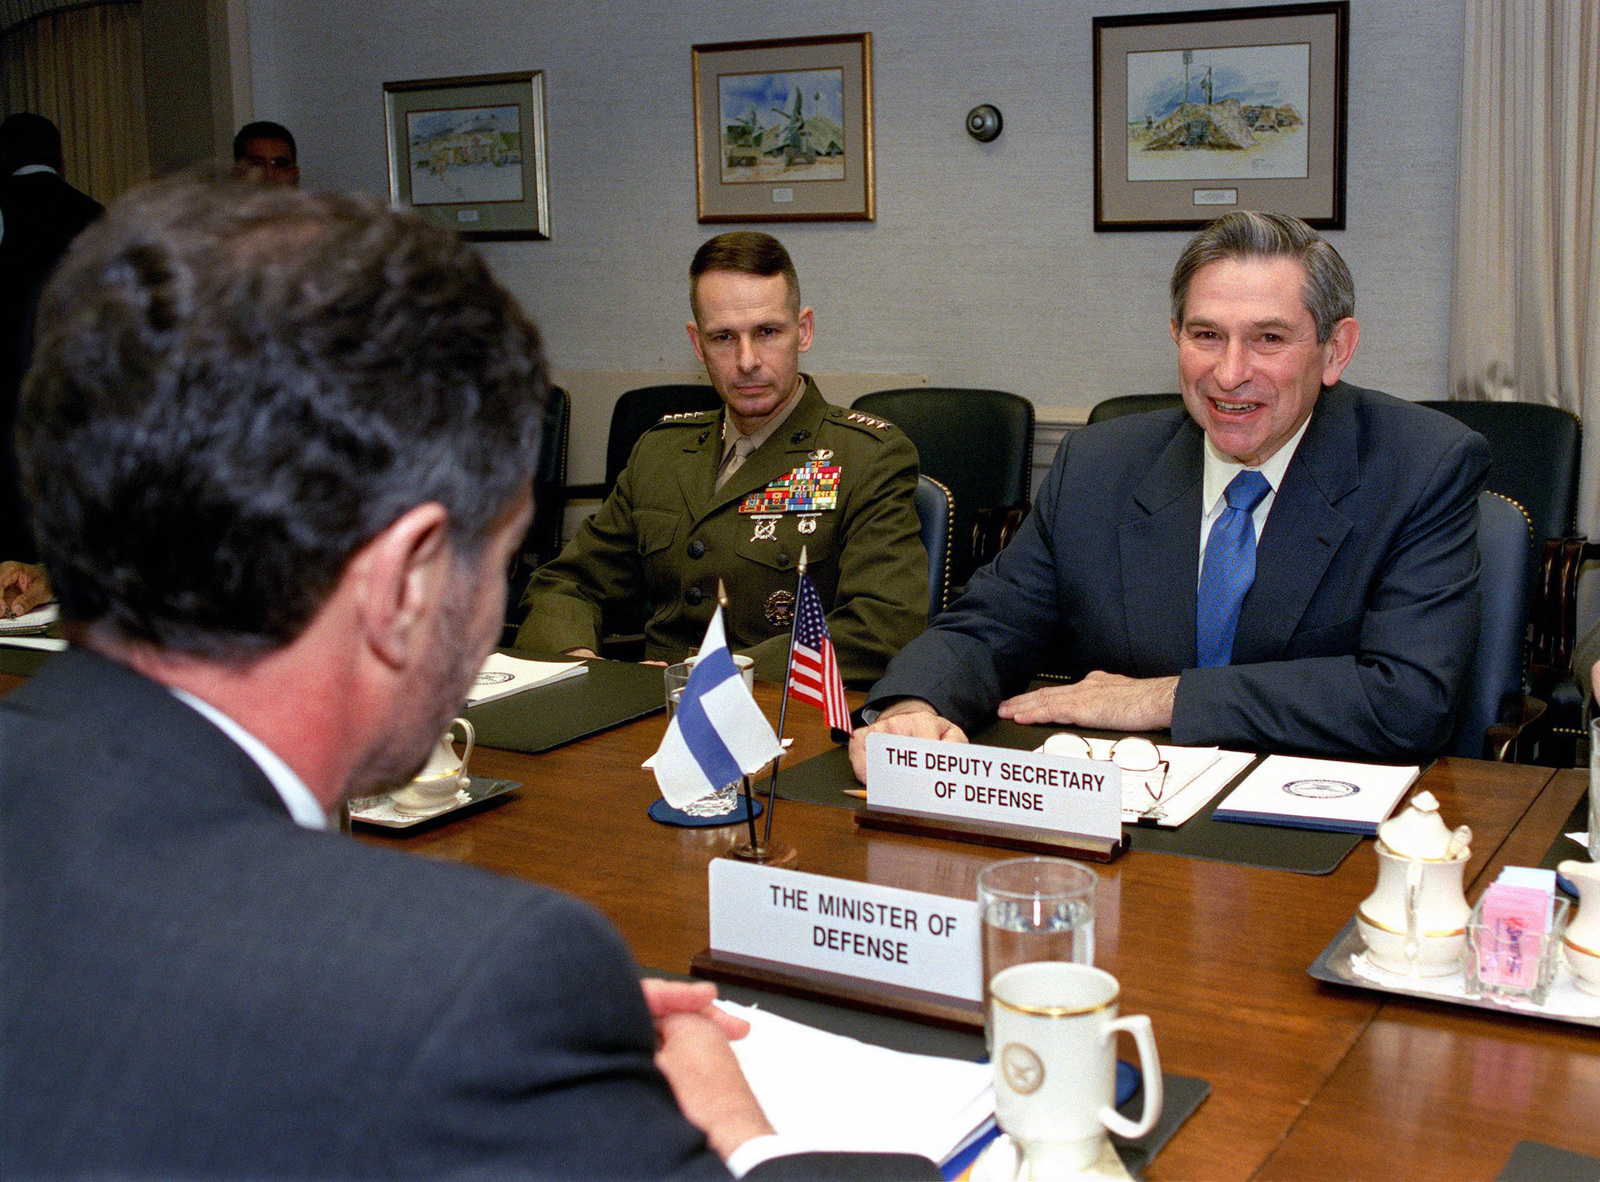 US Deputy Secretary of Defense The Honorable Paul Wolfowitz 1600x1182